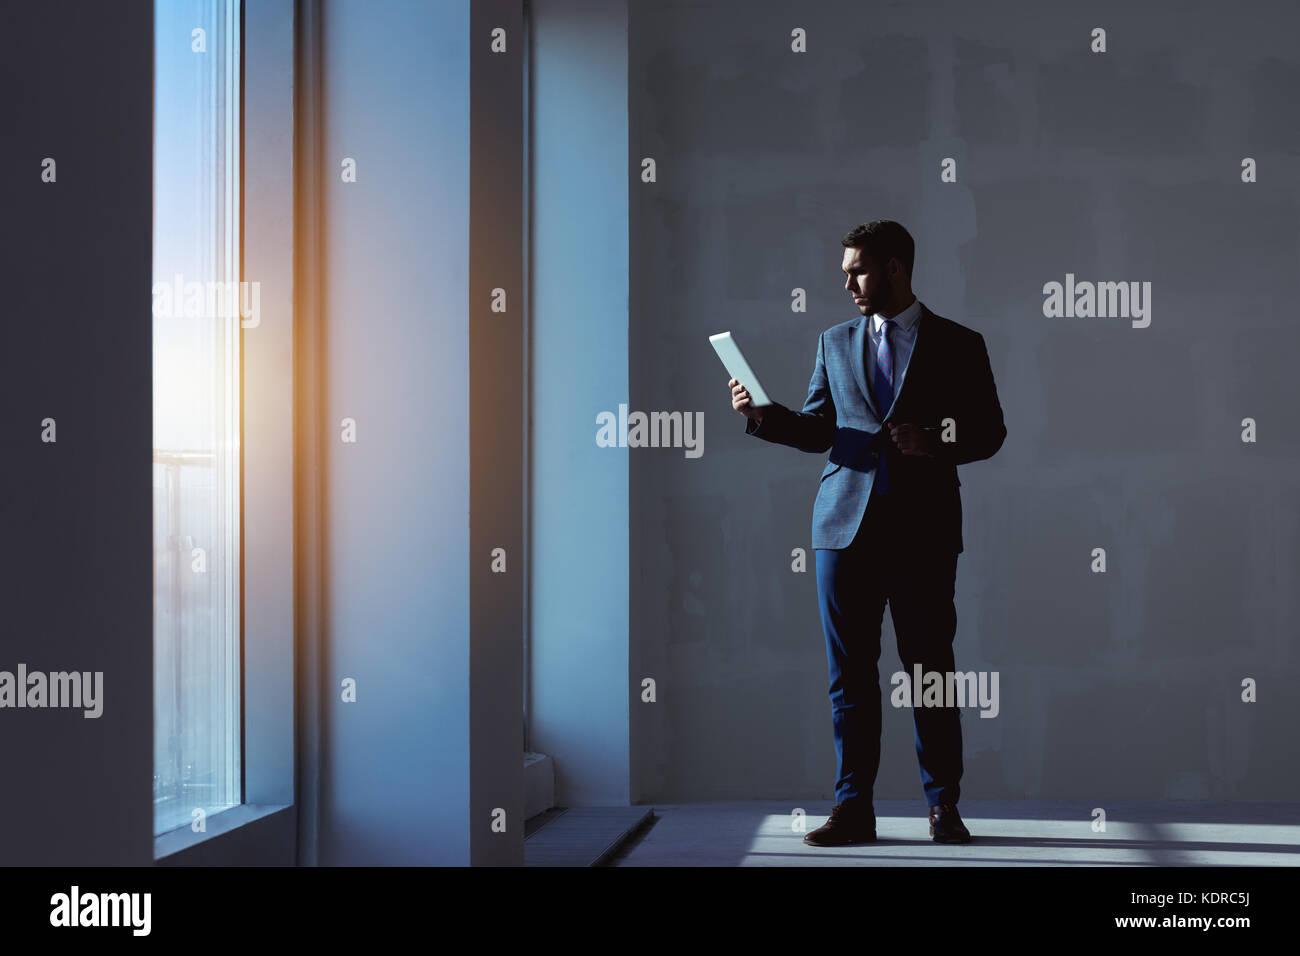 Inmobiliaria apartamento concepto de tablet pc Imagen De Stock